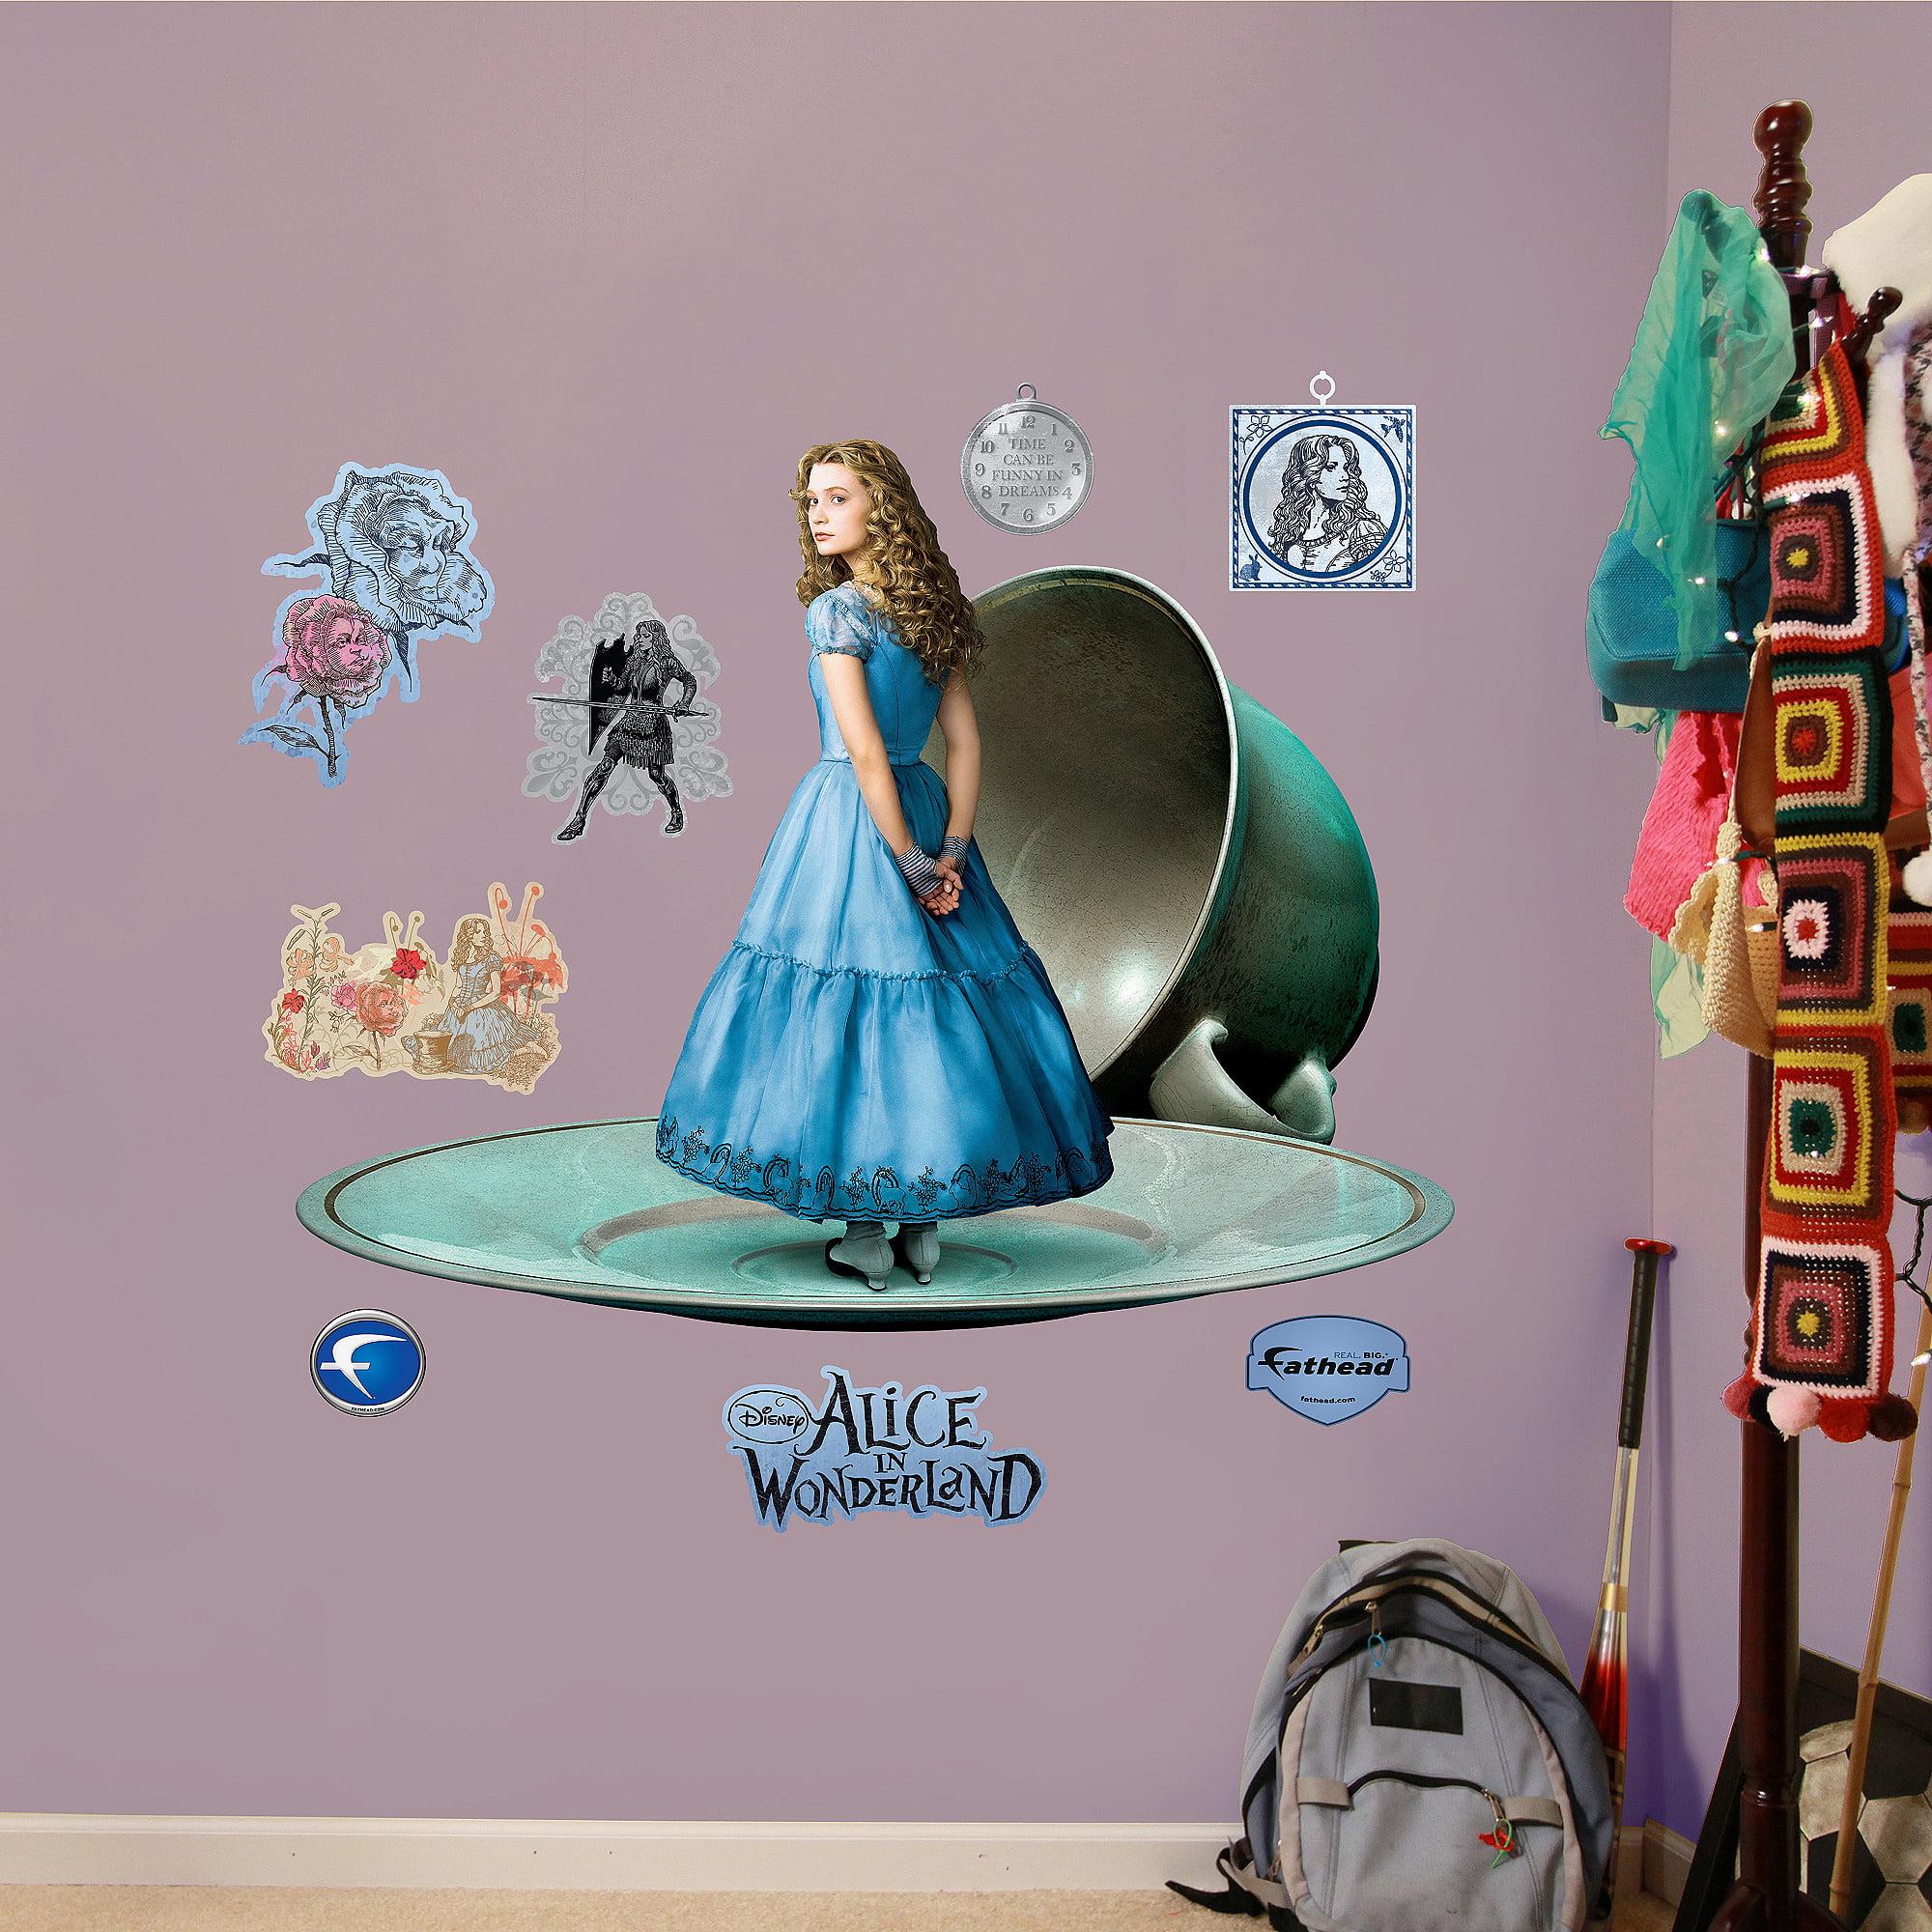 Alice in Wonderland 74-74521